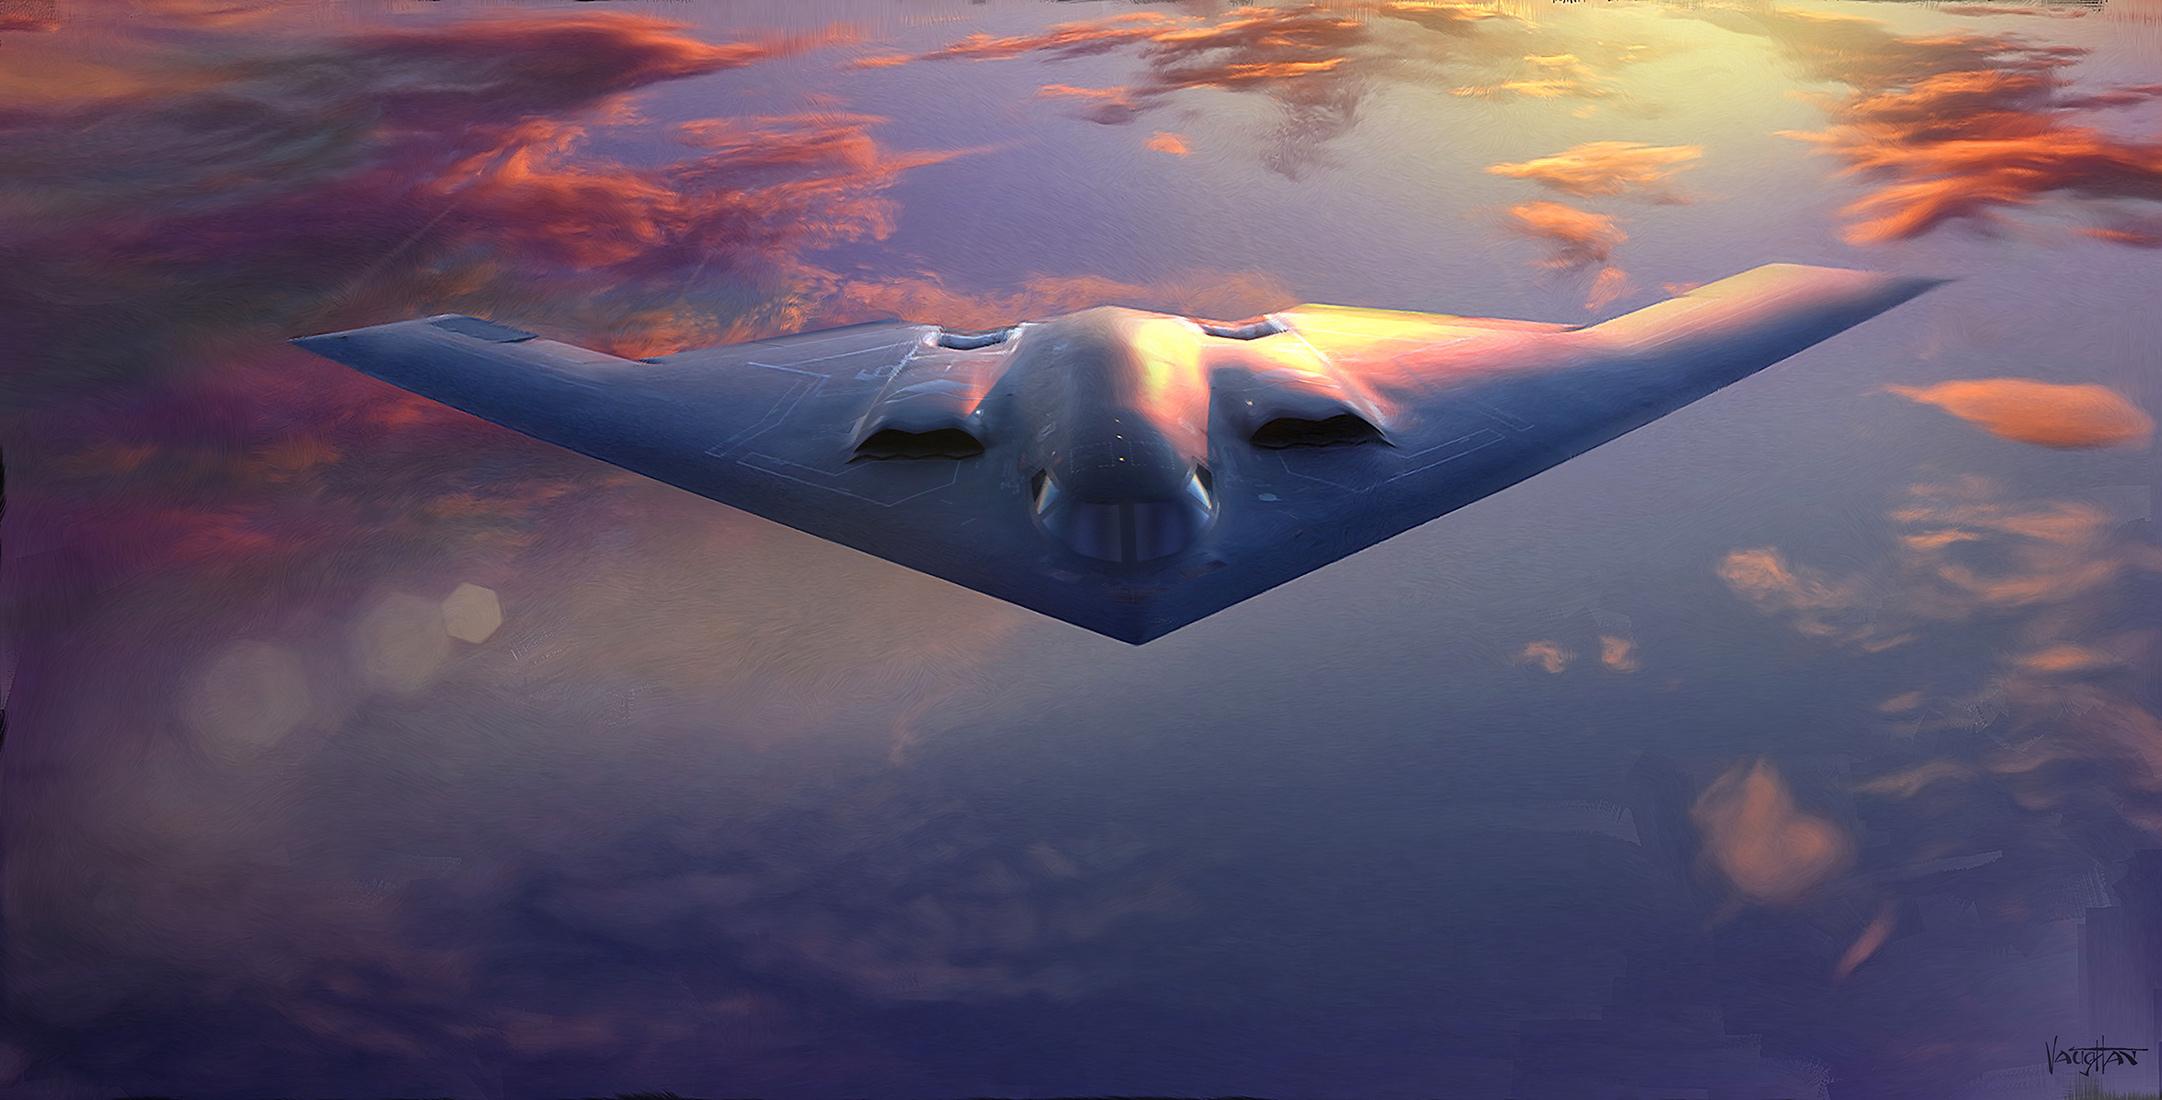 Northrop Grumman B 2 Spirit HD Wallpaper Background Image 2162x1100